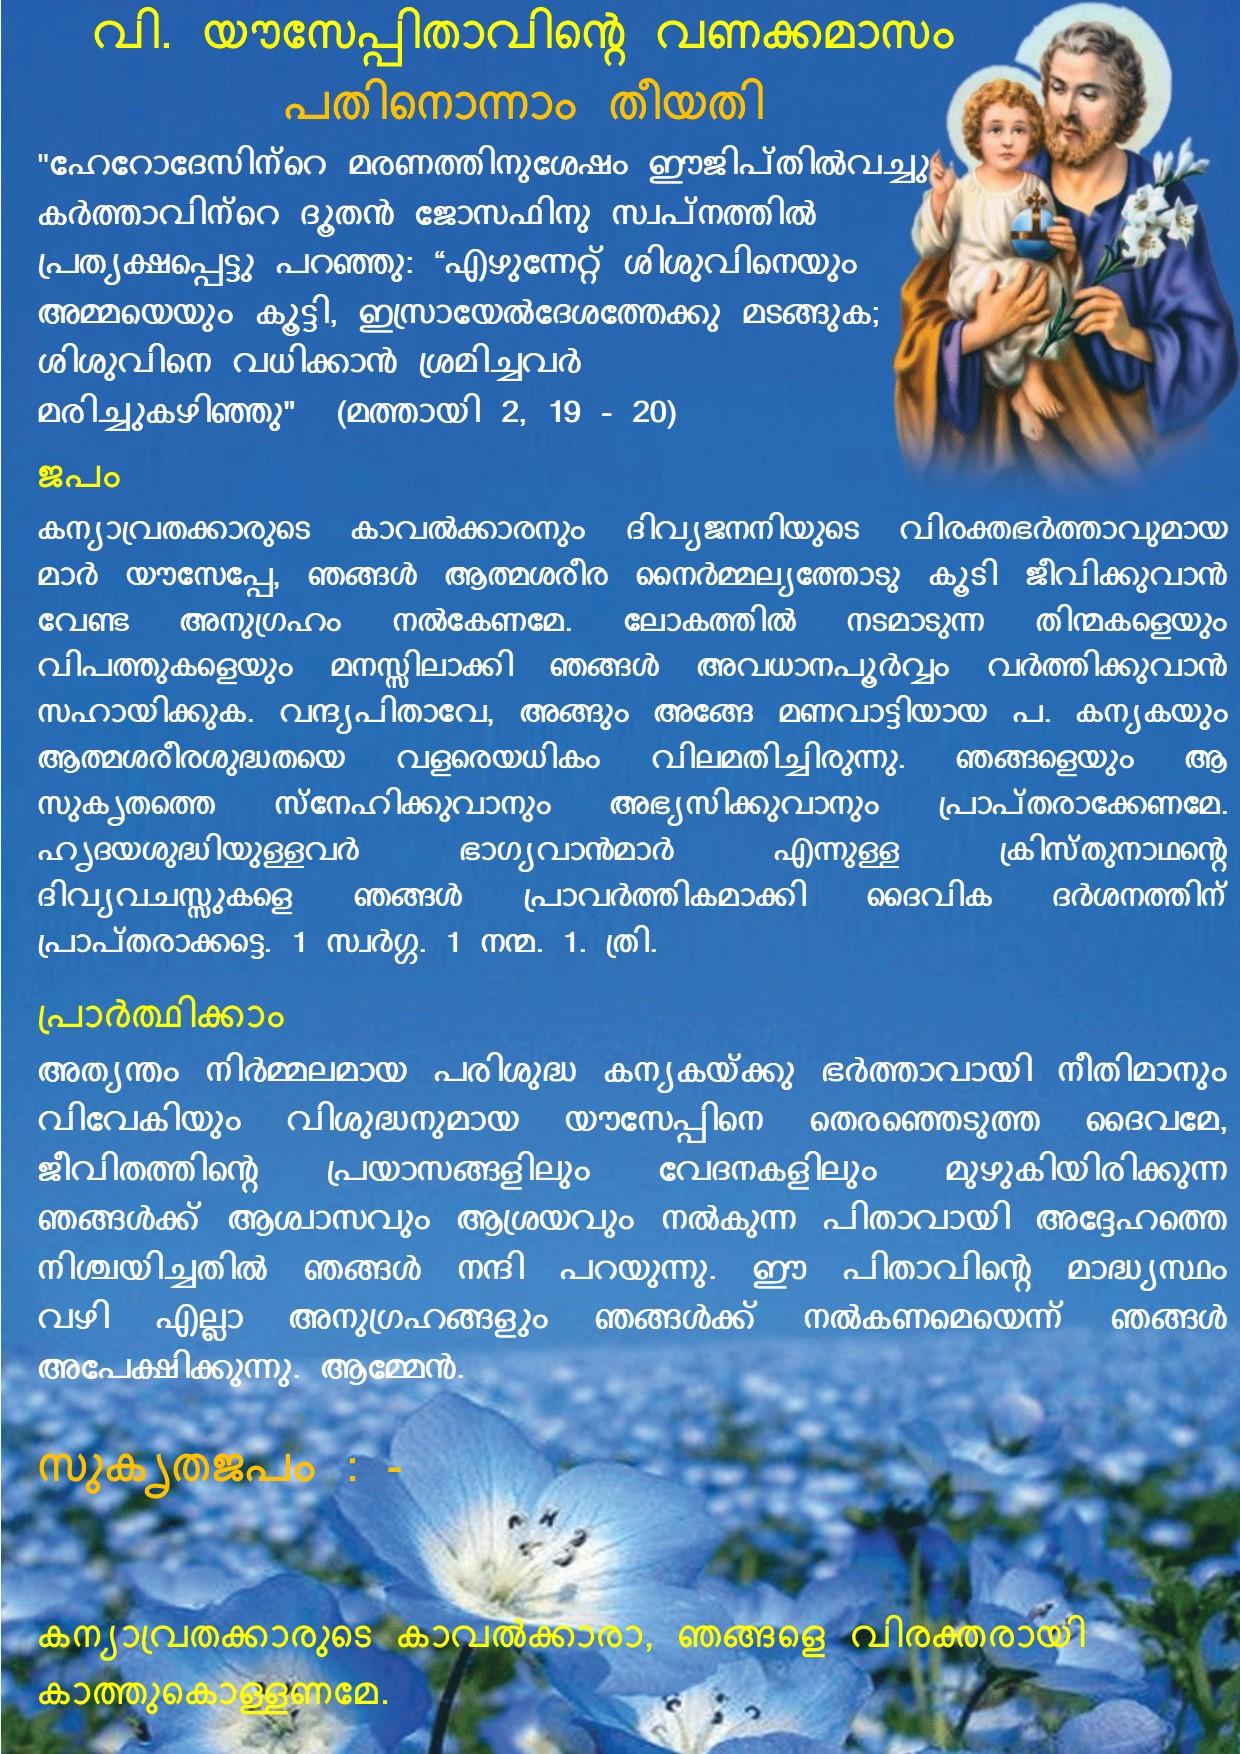 Vanakkamasam, St Joseph, March 11